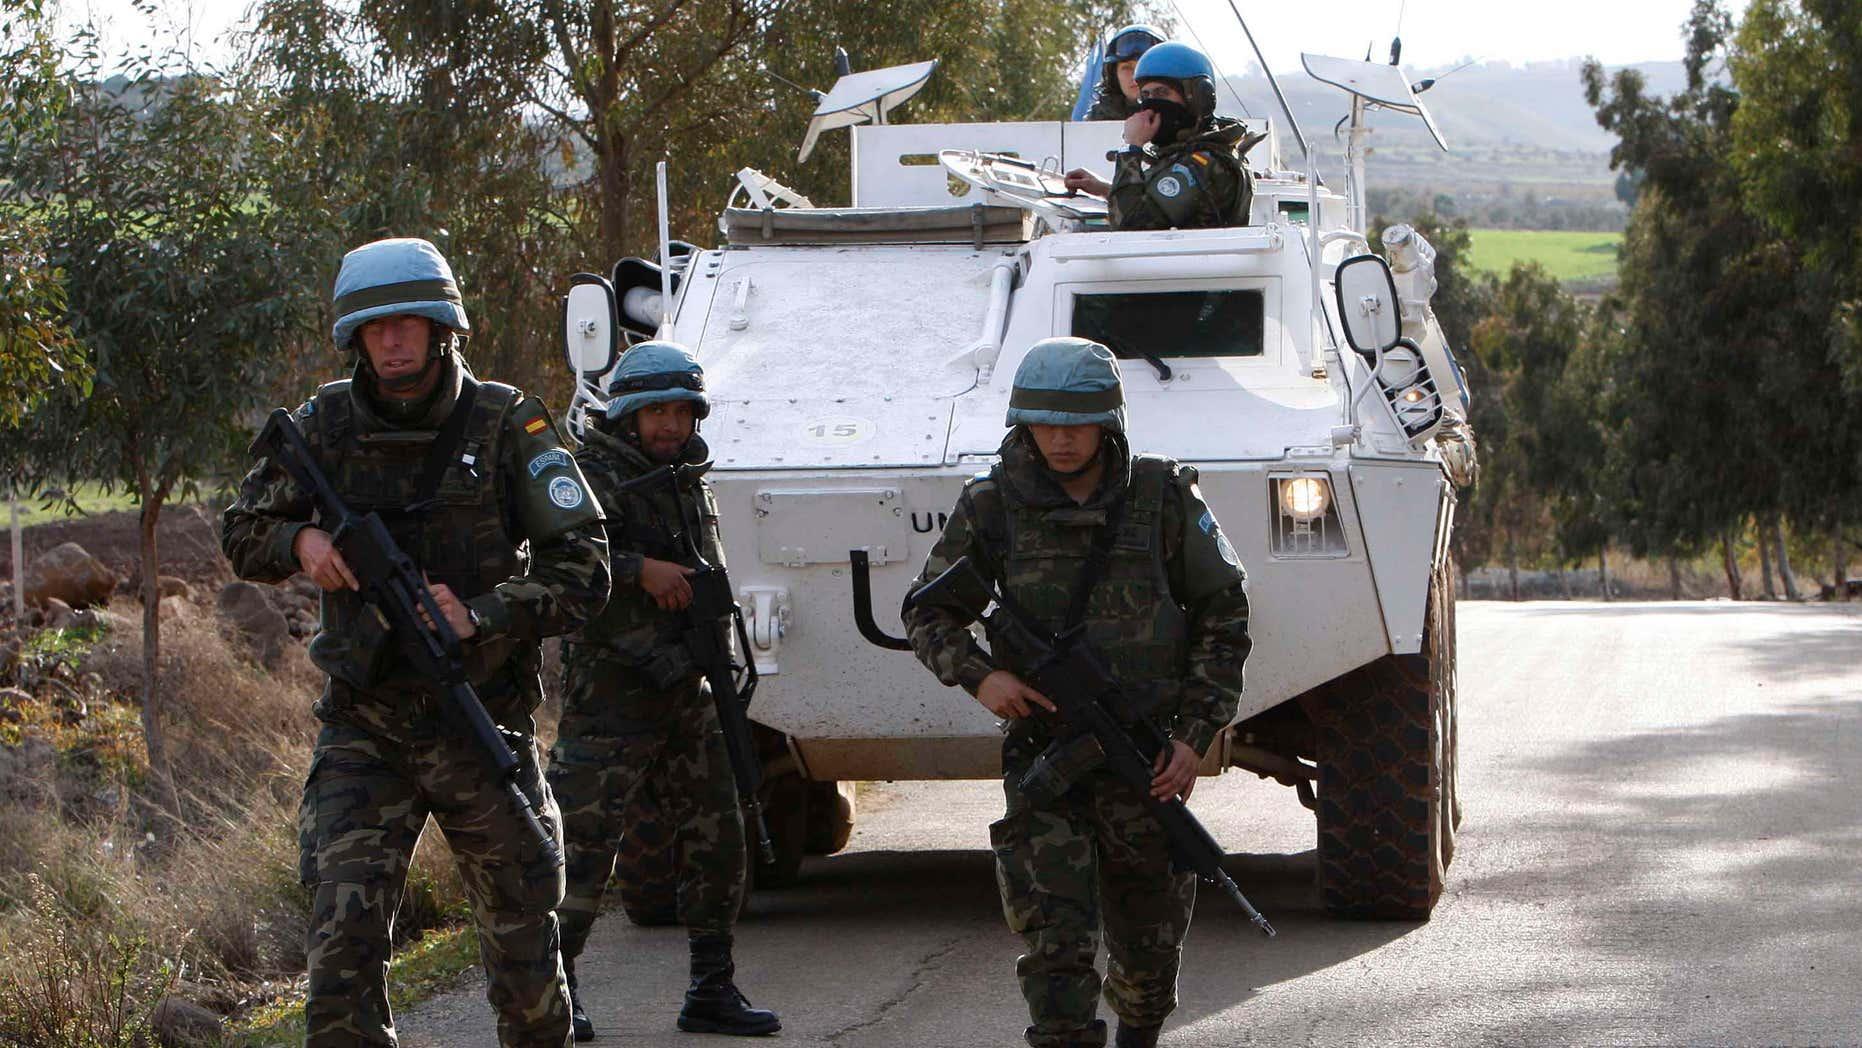 Jan. 14, 2009: Spanish U.N peacekeepers patrol the area where a rocket fell short in Lebanon several kilometers north of the Israeli border, near the village of el-Meri, southern Lebanon. Russia's aggressiveness in the east.